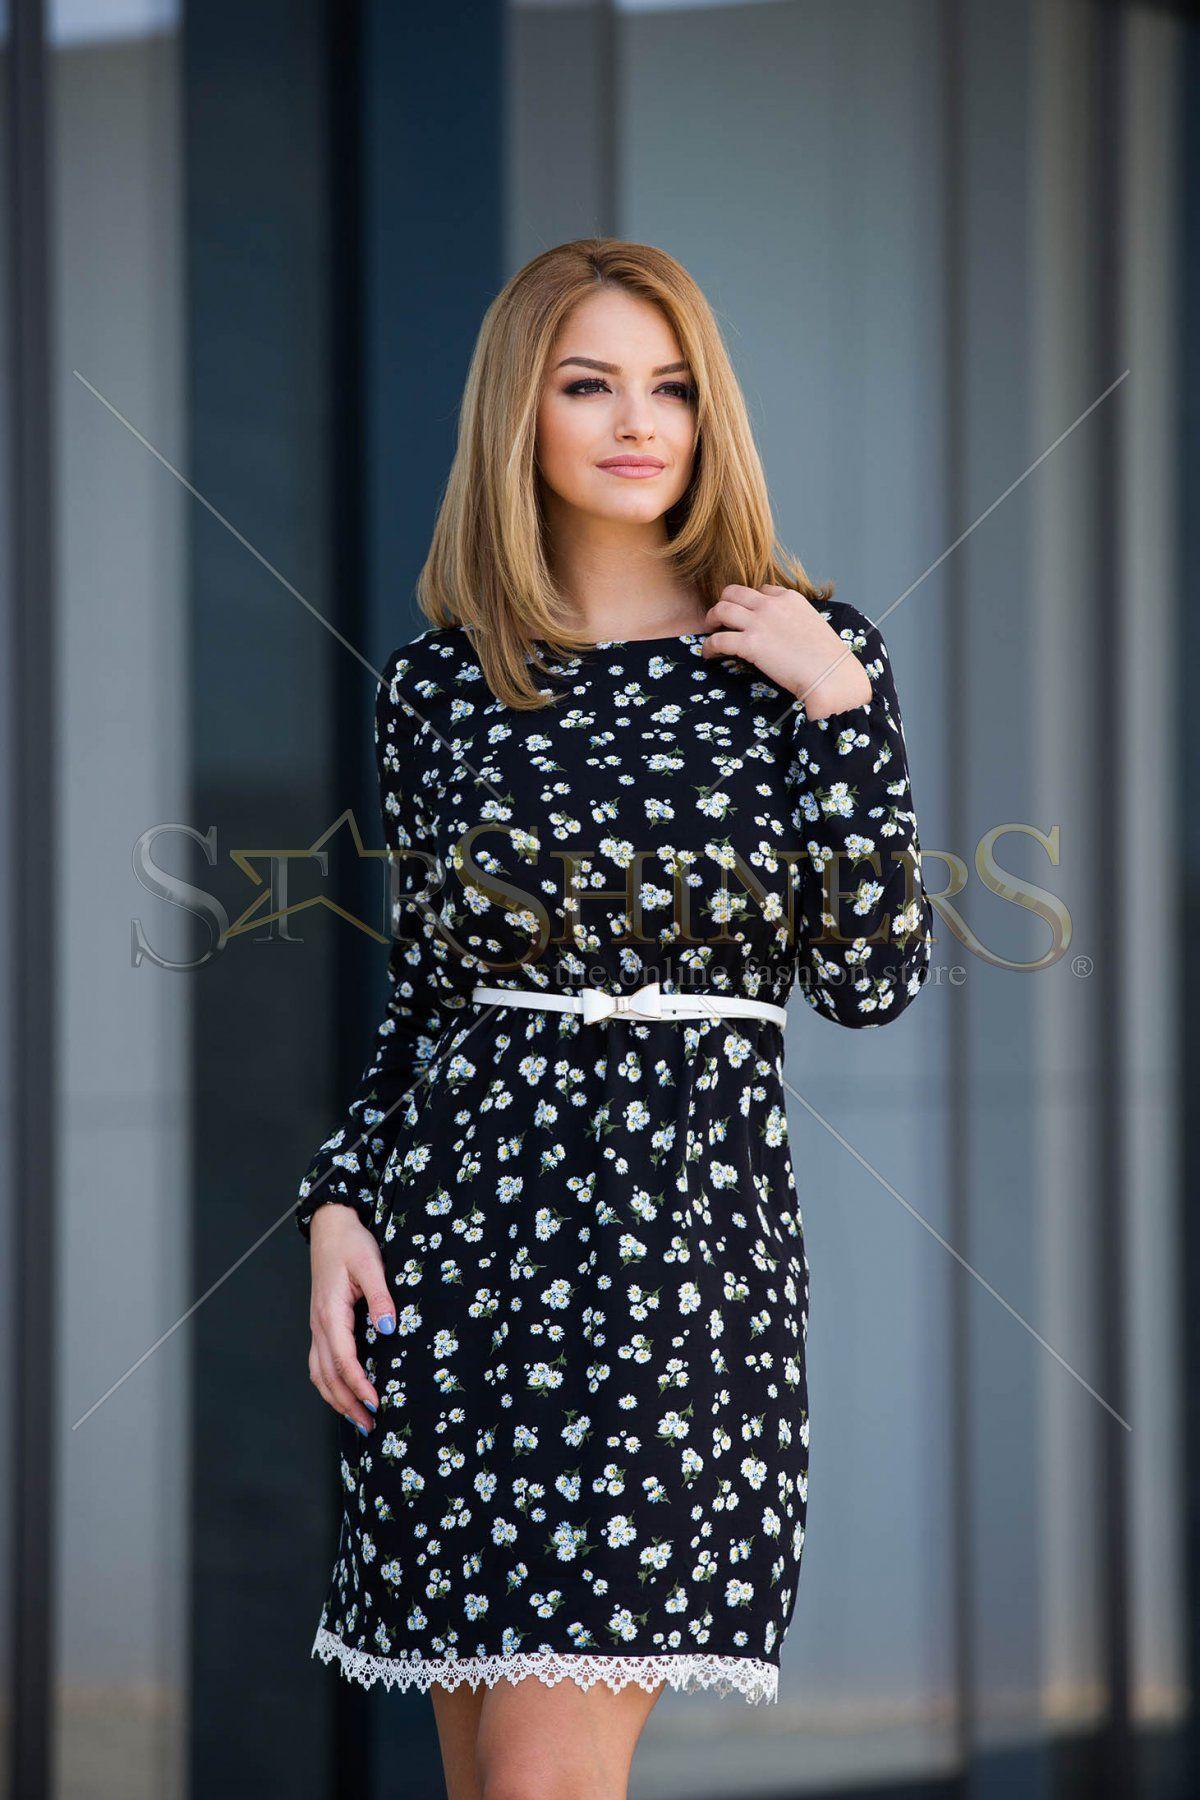 Starshiners dressy black dress stylo pinterest black dress